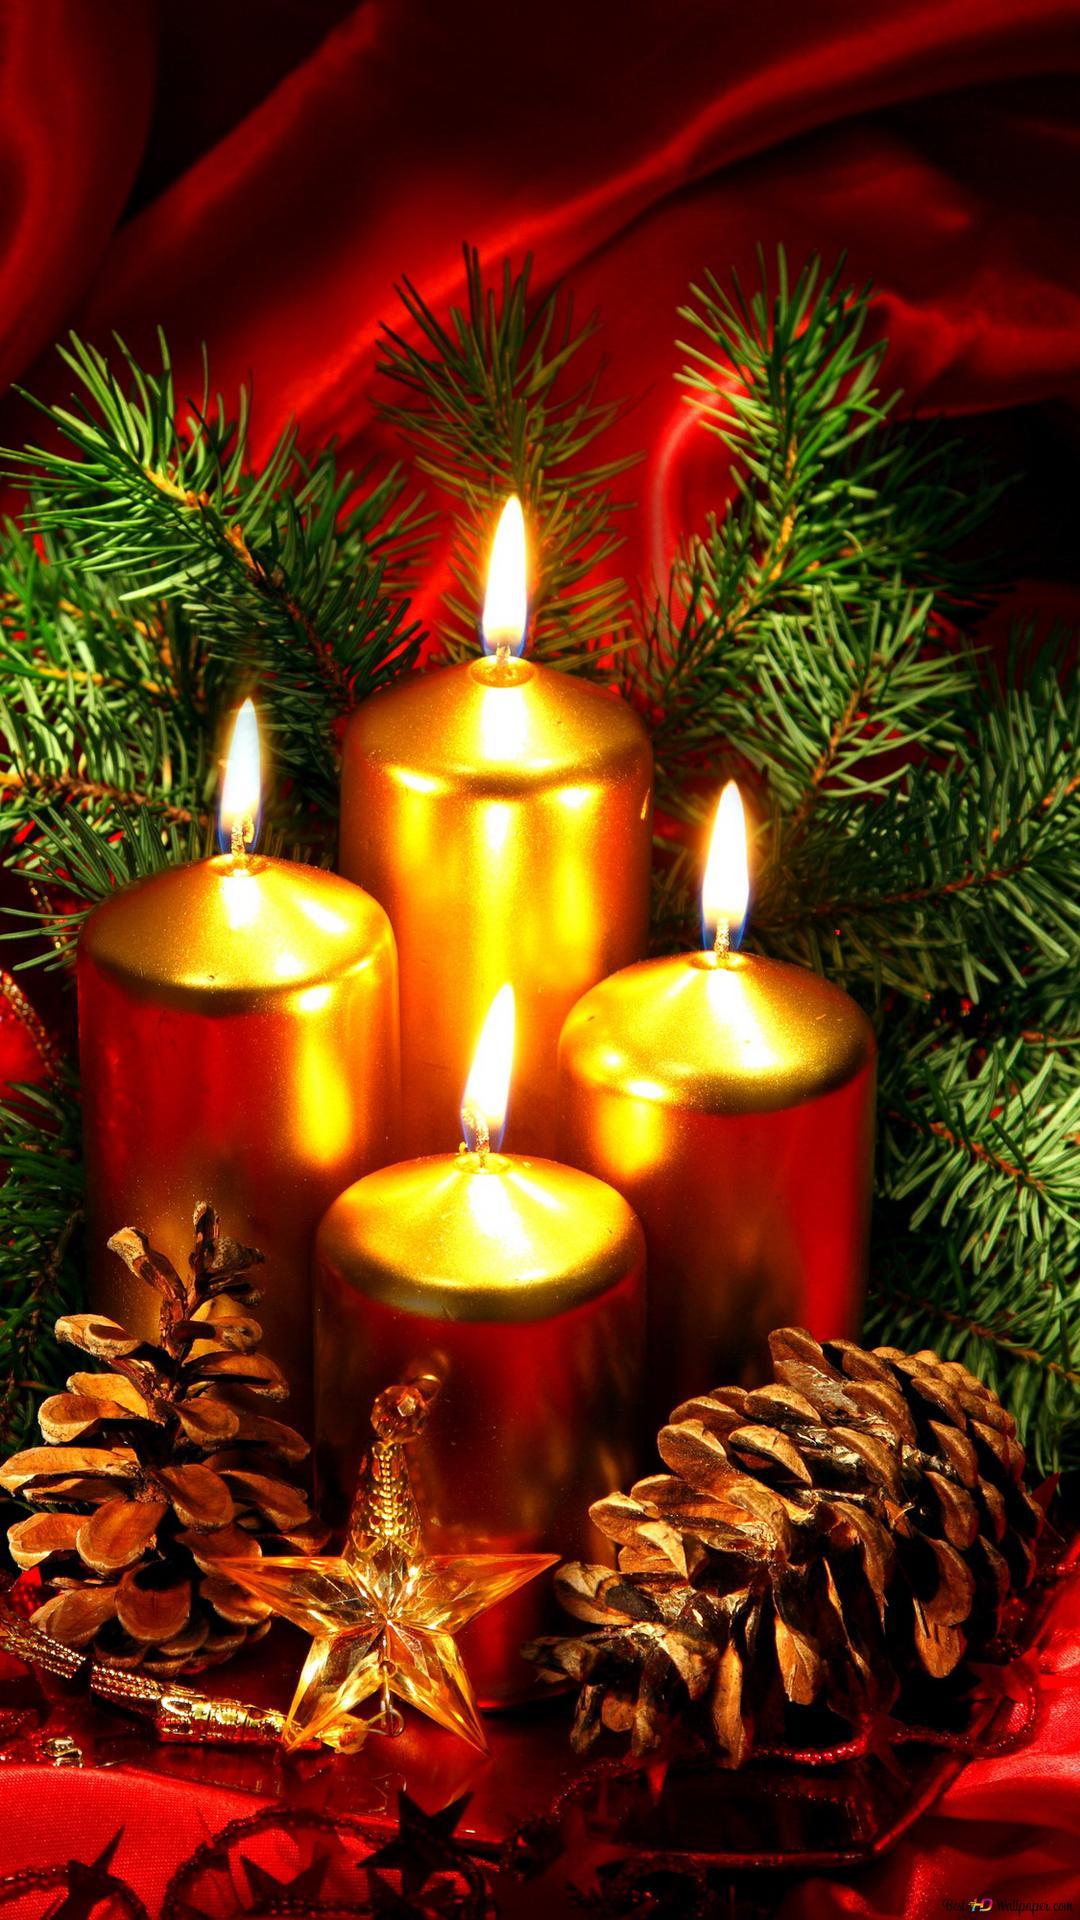 Christmas Candles Hd Wallpaper Download